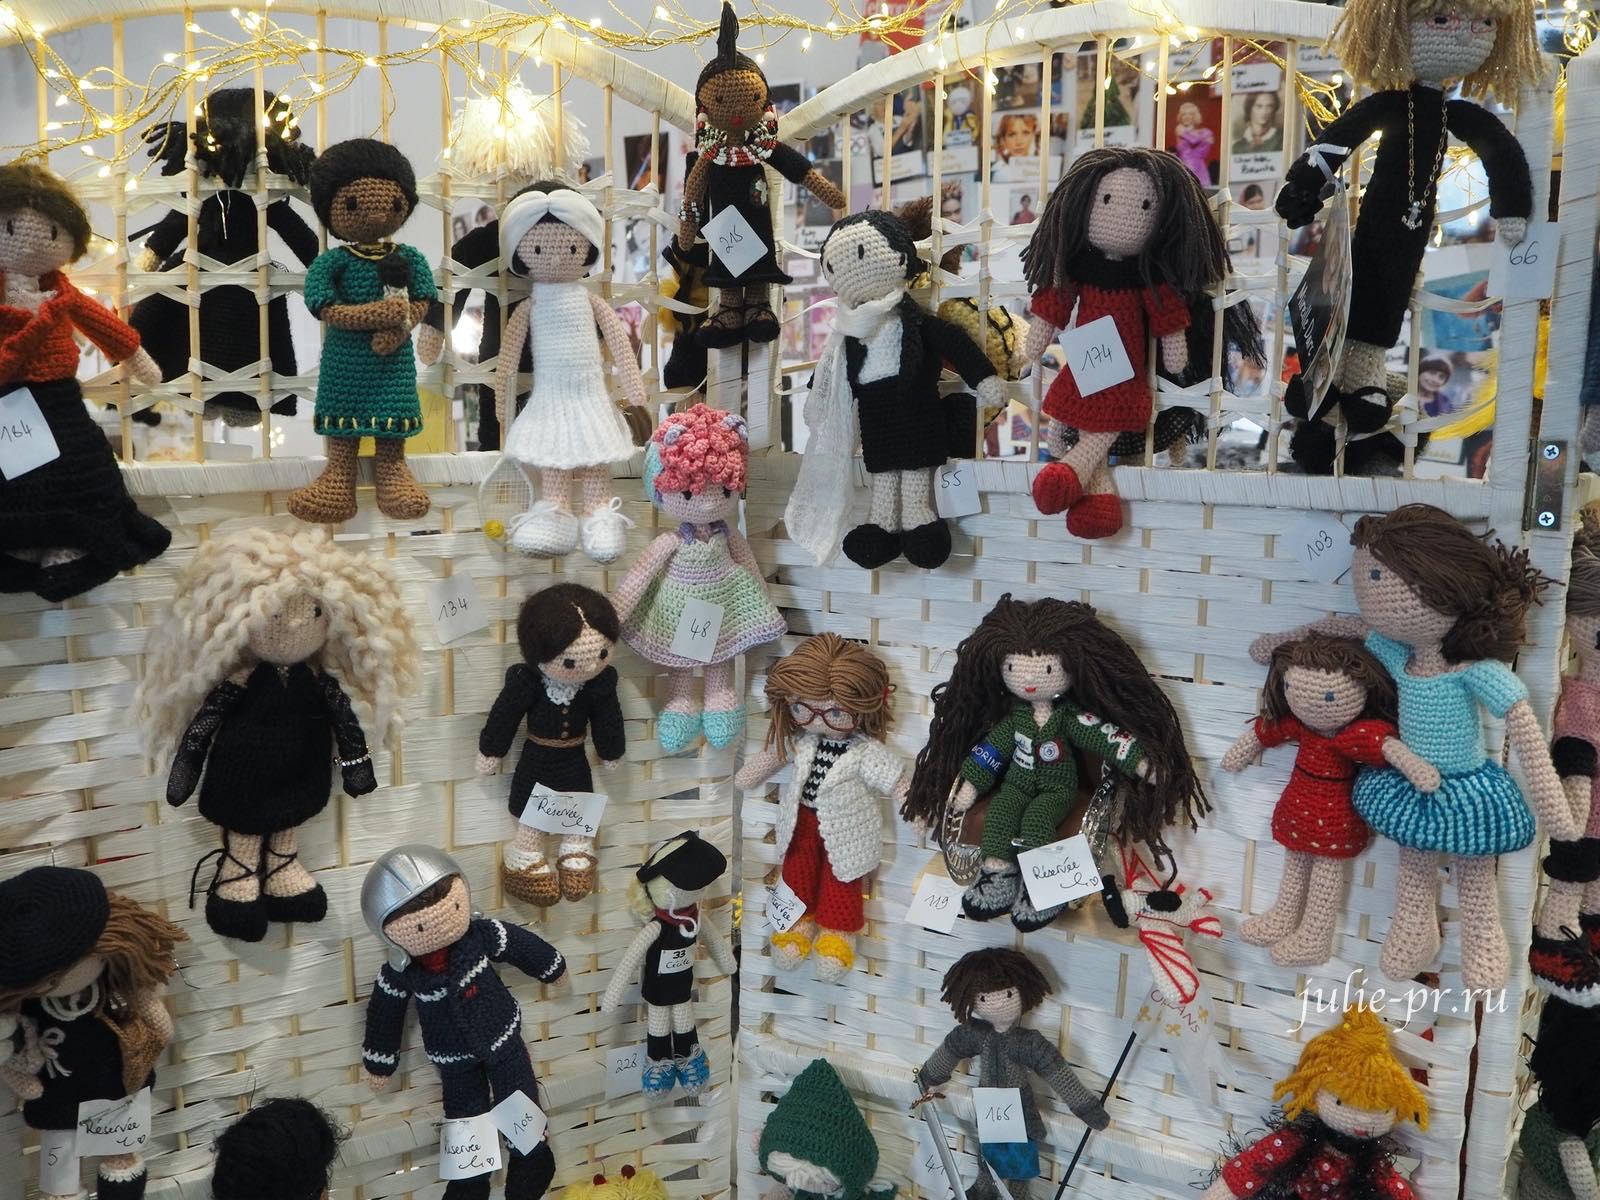 рукодельный салон Creations & Savoir-Faire 2019, рукодельная выставка, Париж, вязаные куклы